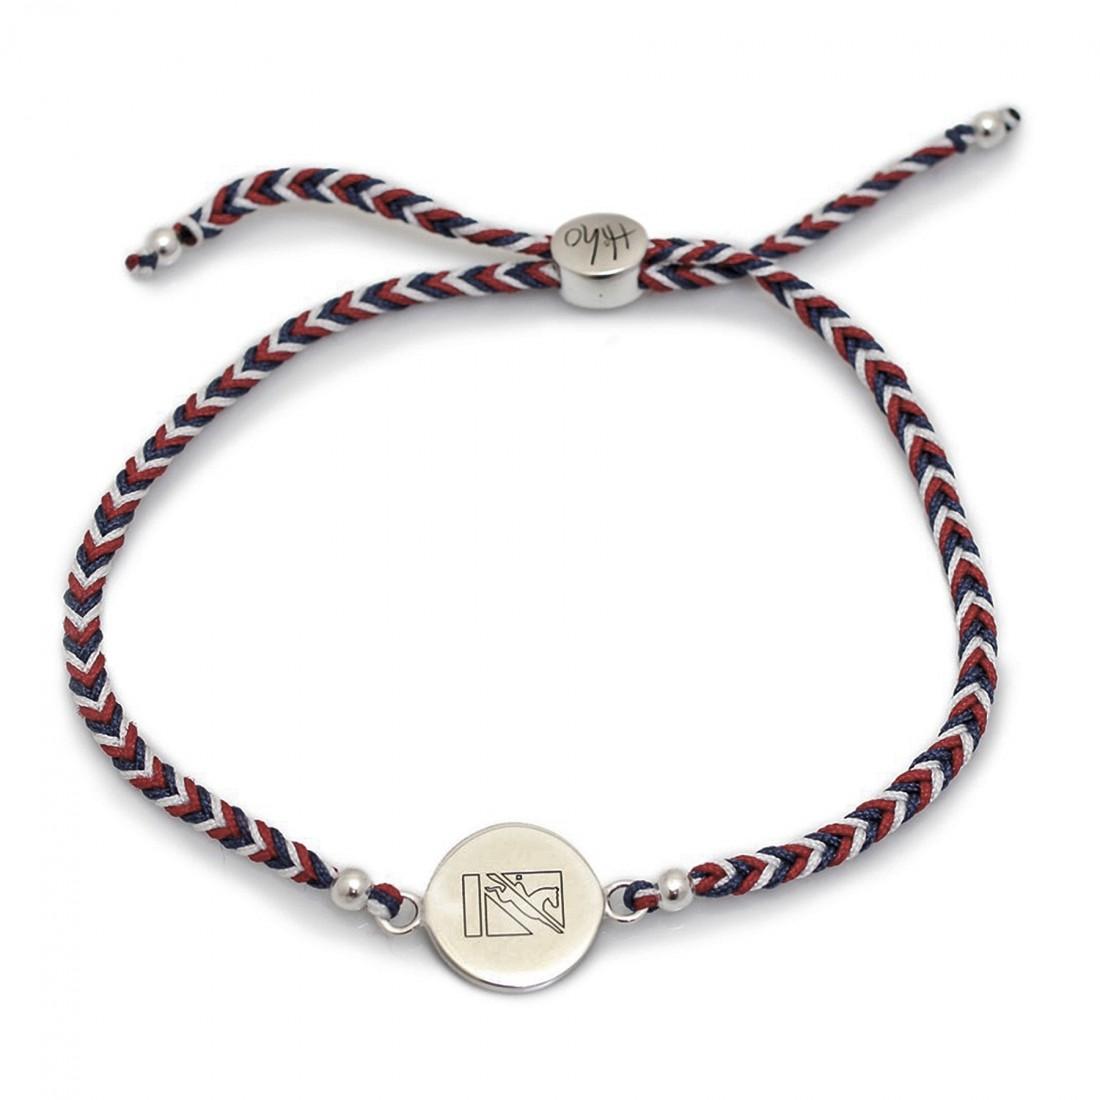 Exclusive Sterling Silver British Eventing Friendship Bracelet